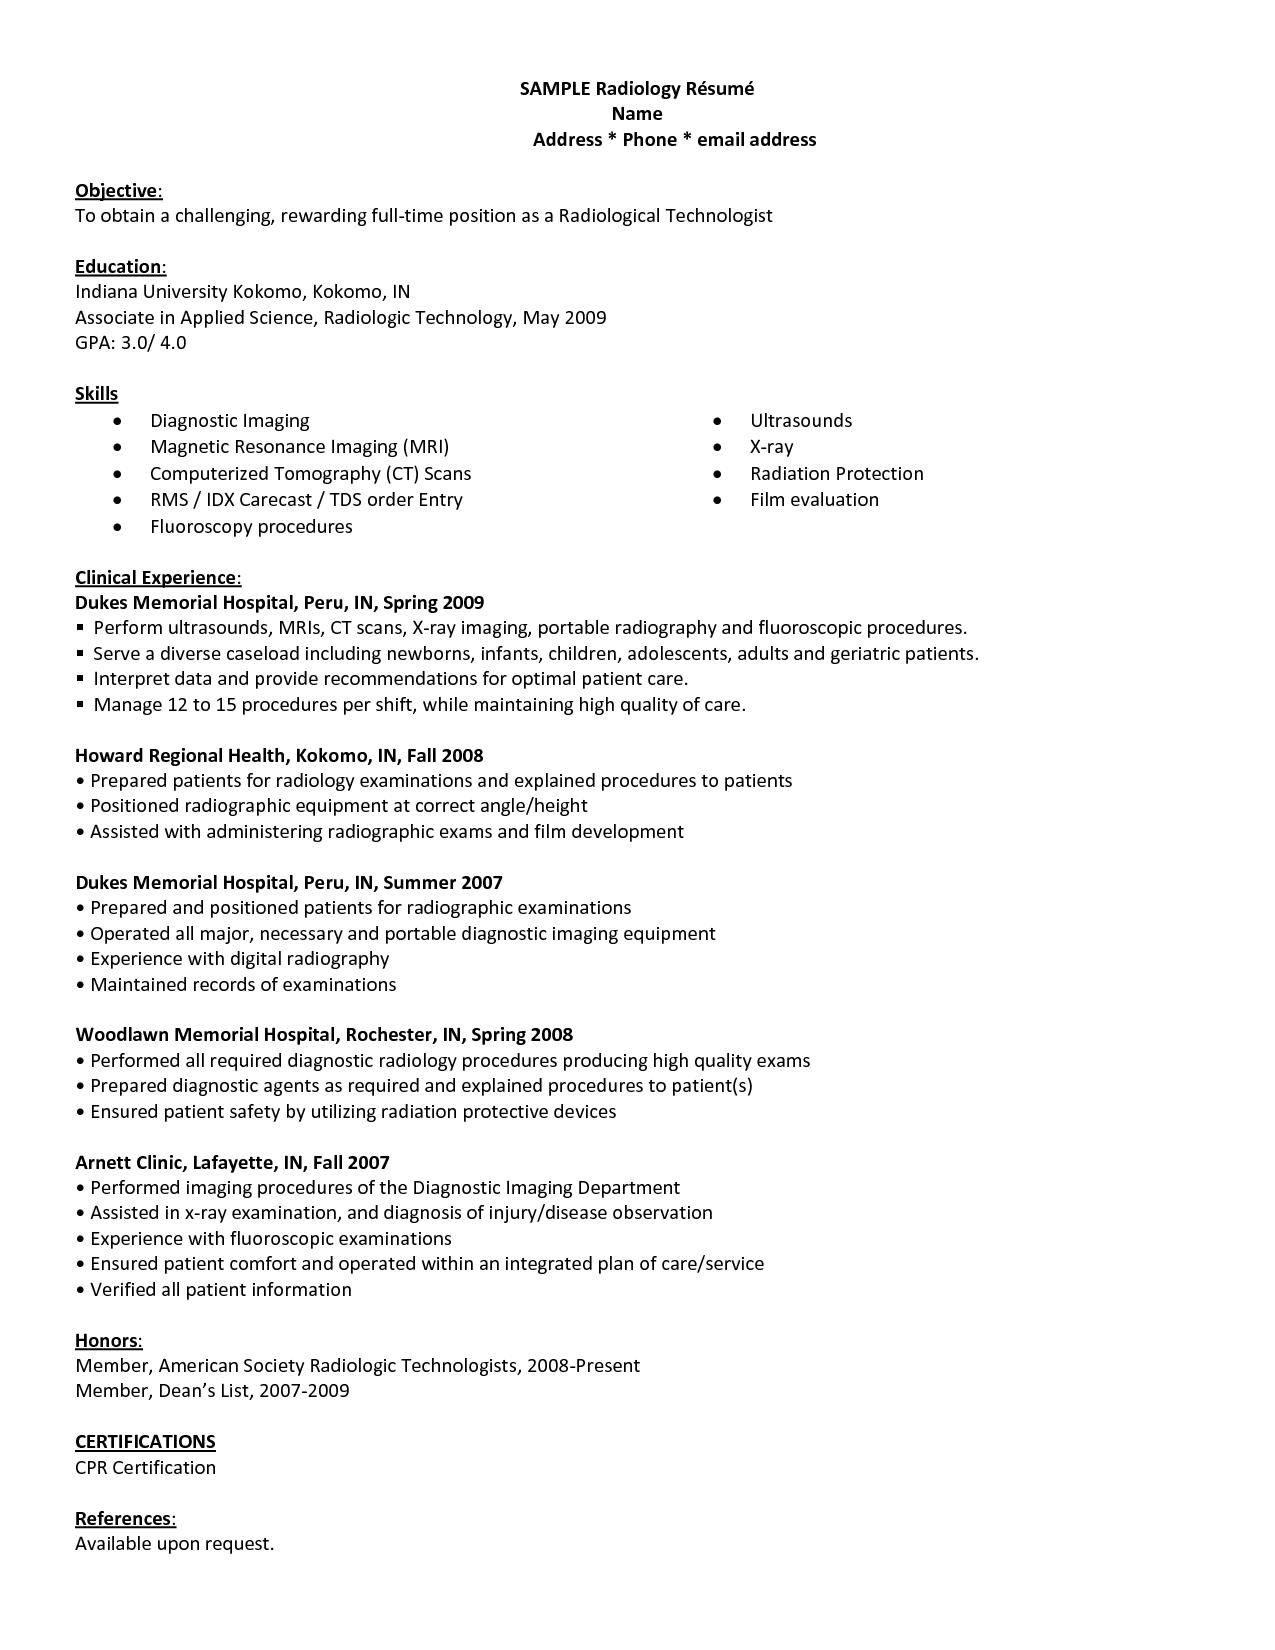 Resume Sample Radiologic Technologist